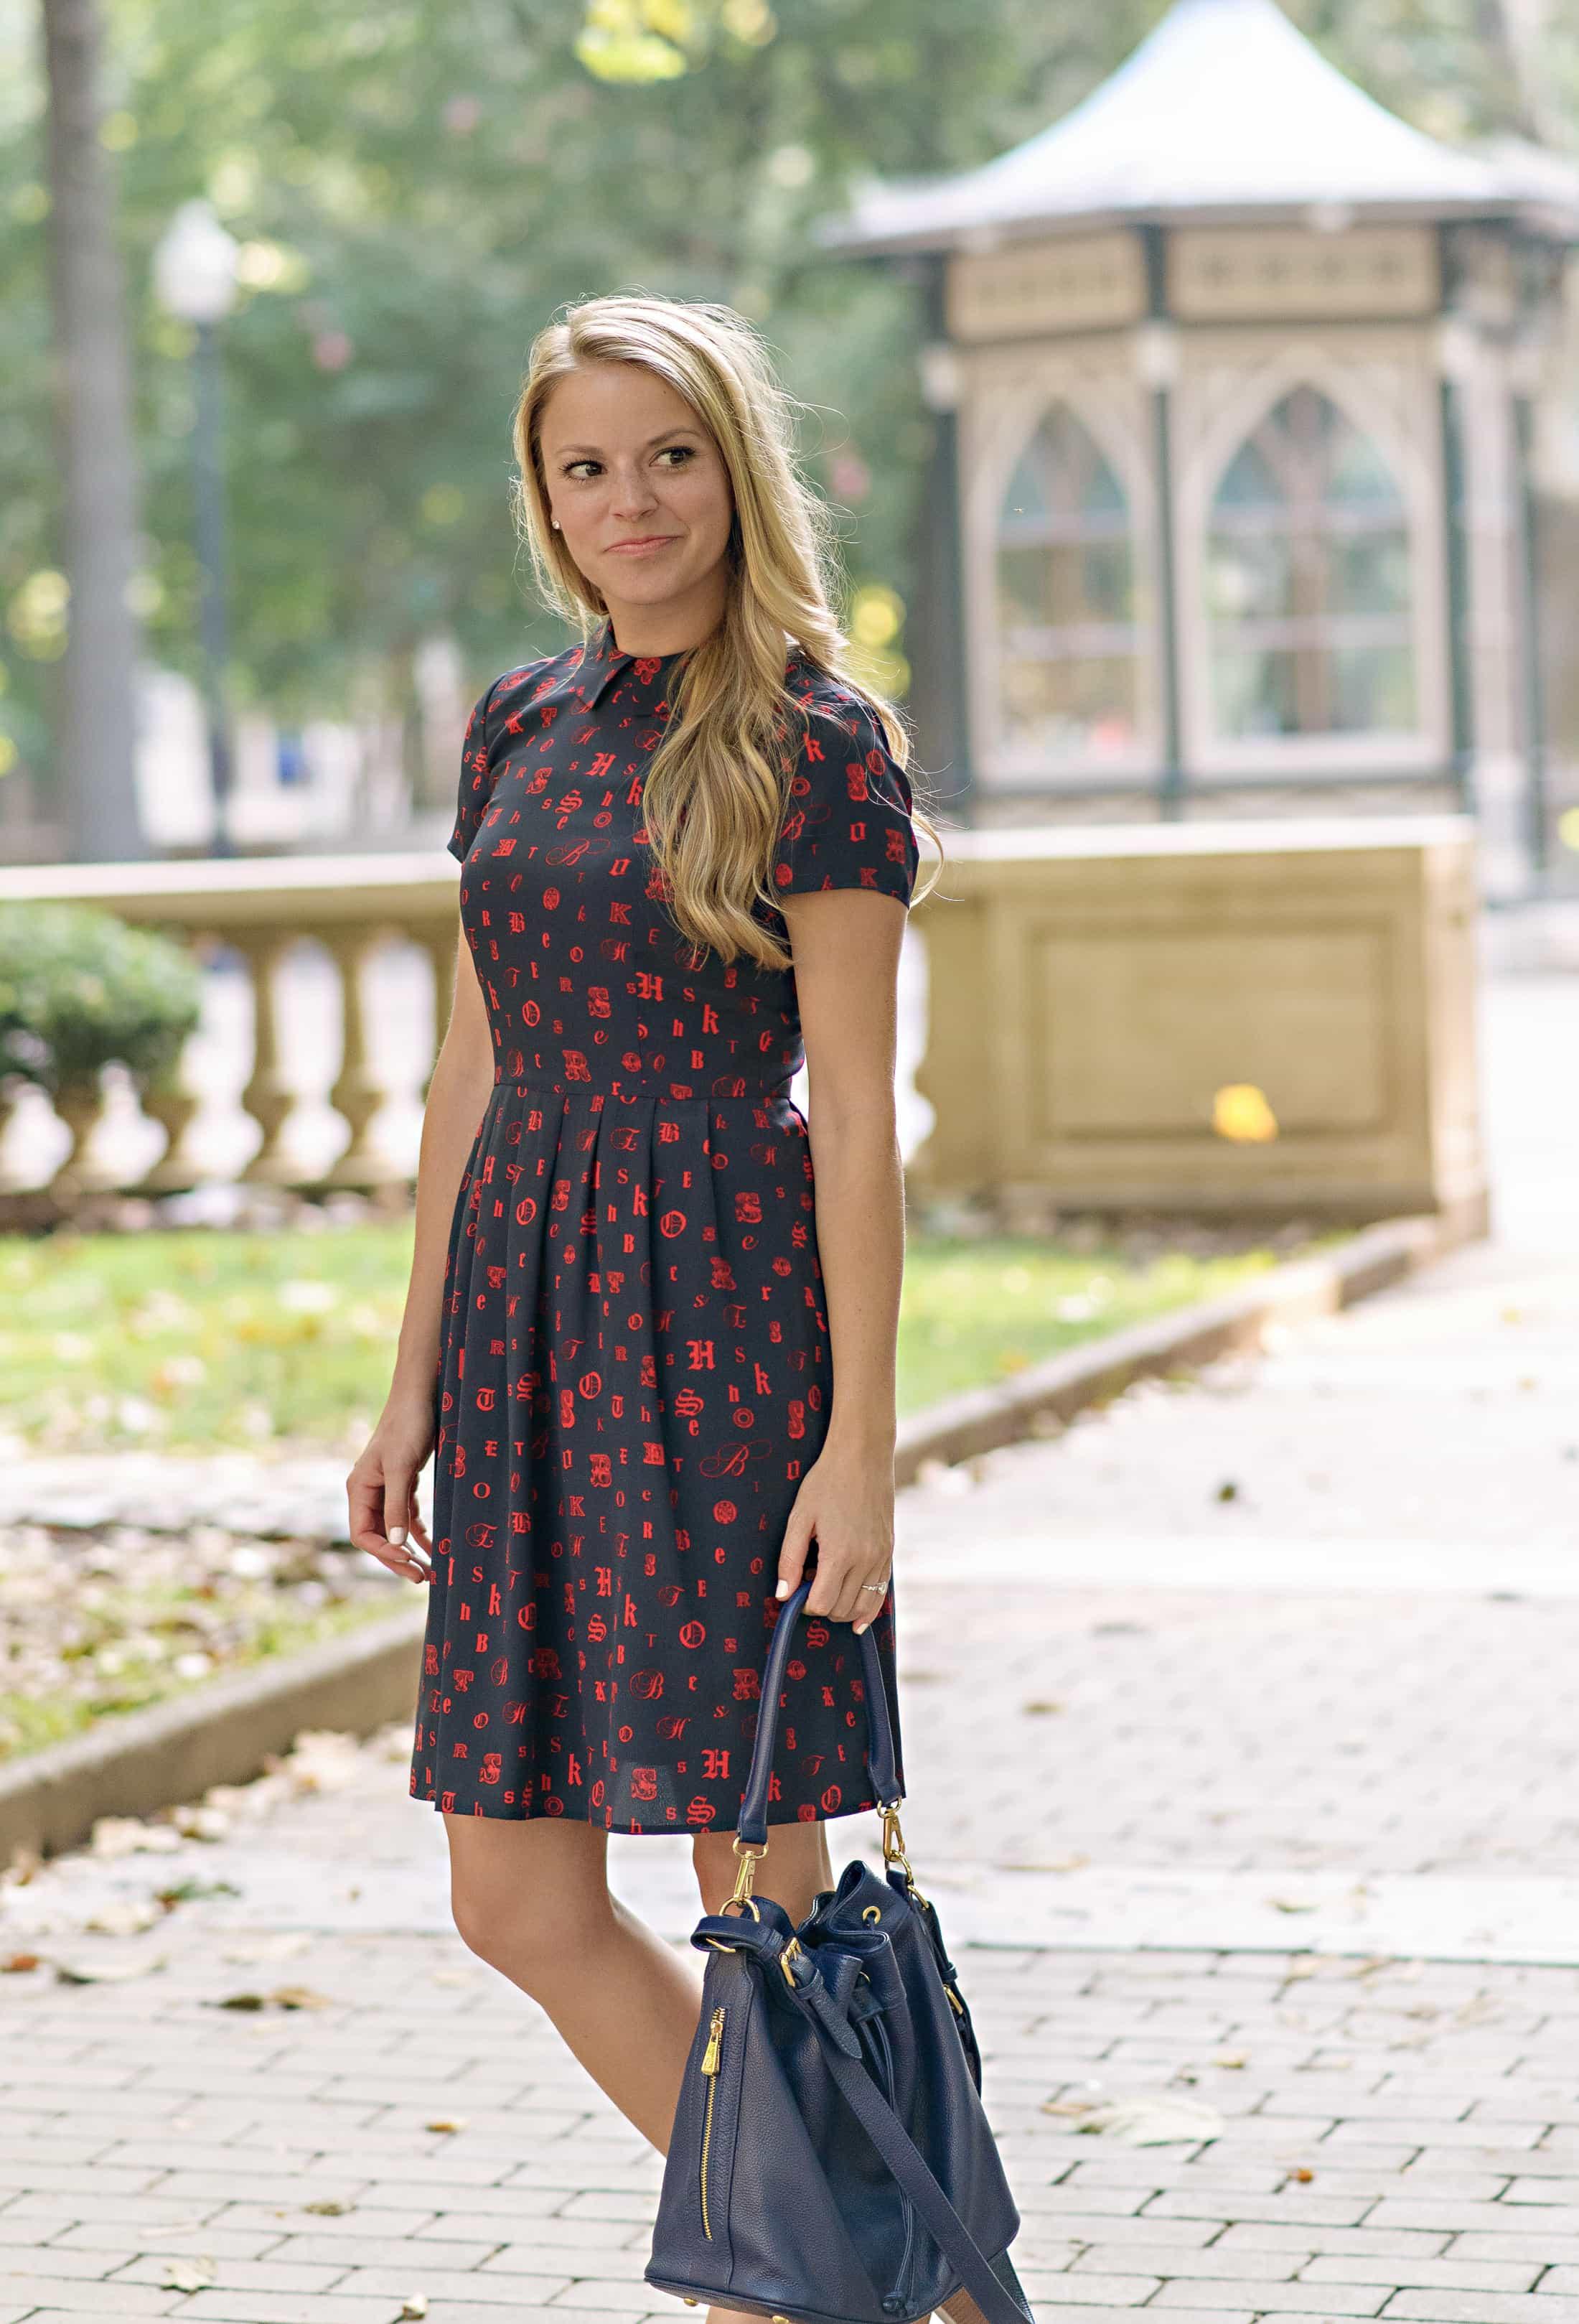 Red Fleece Silk Printed Dress Styled Snapshots